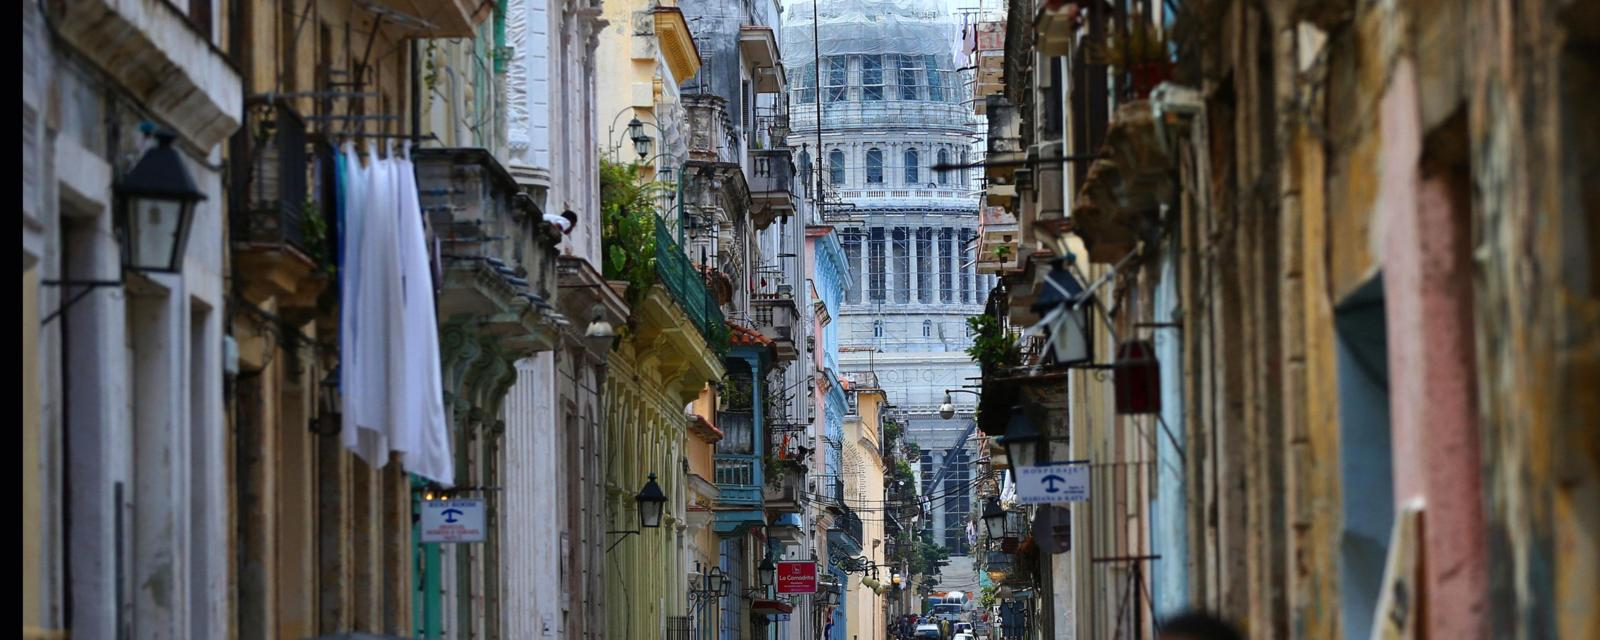 Cuba - BBC